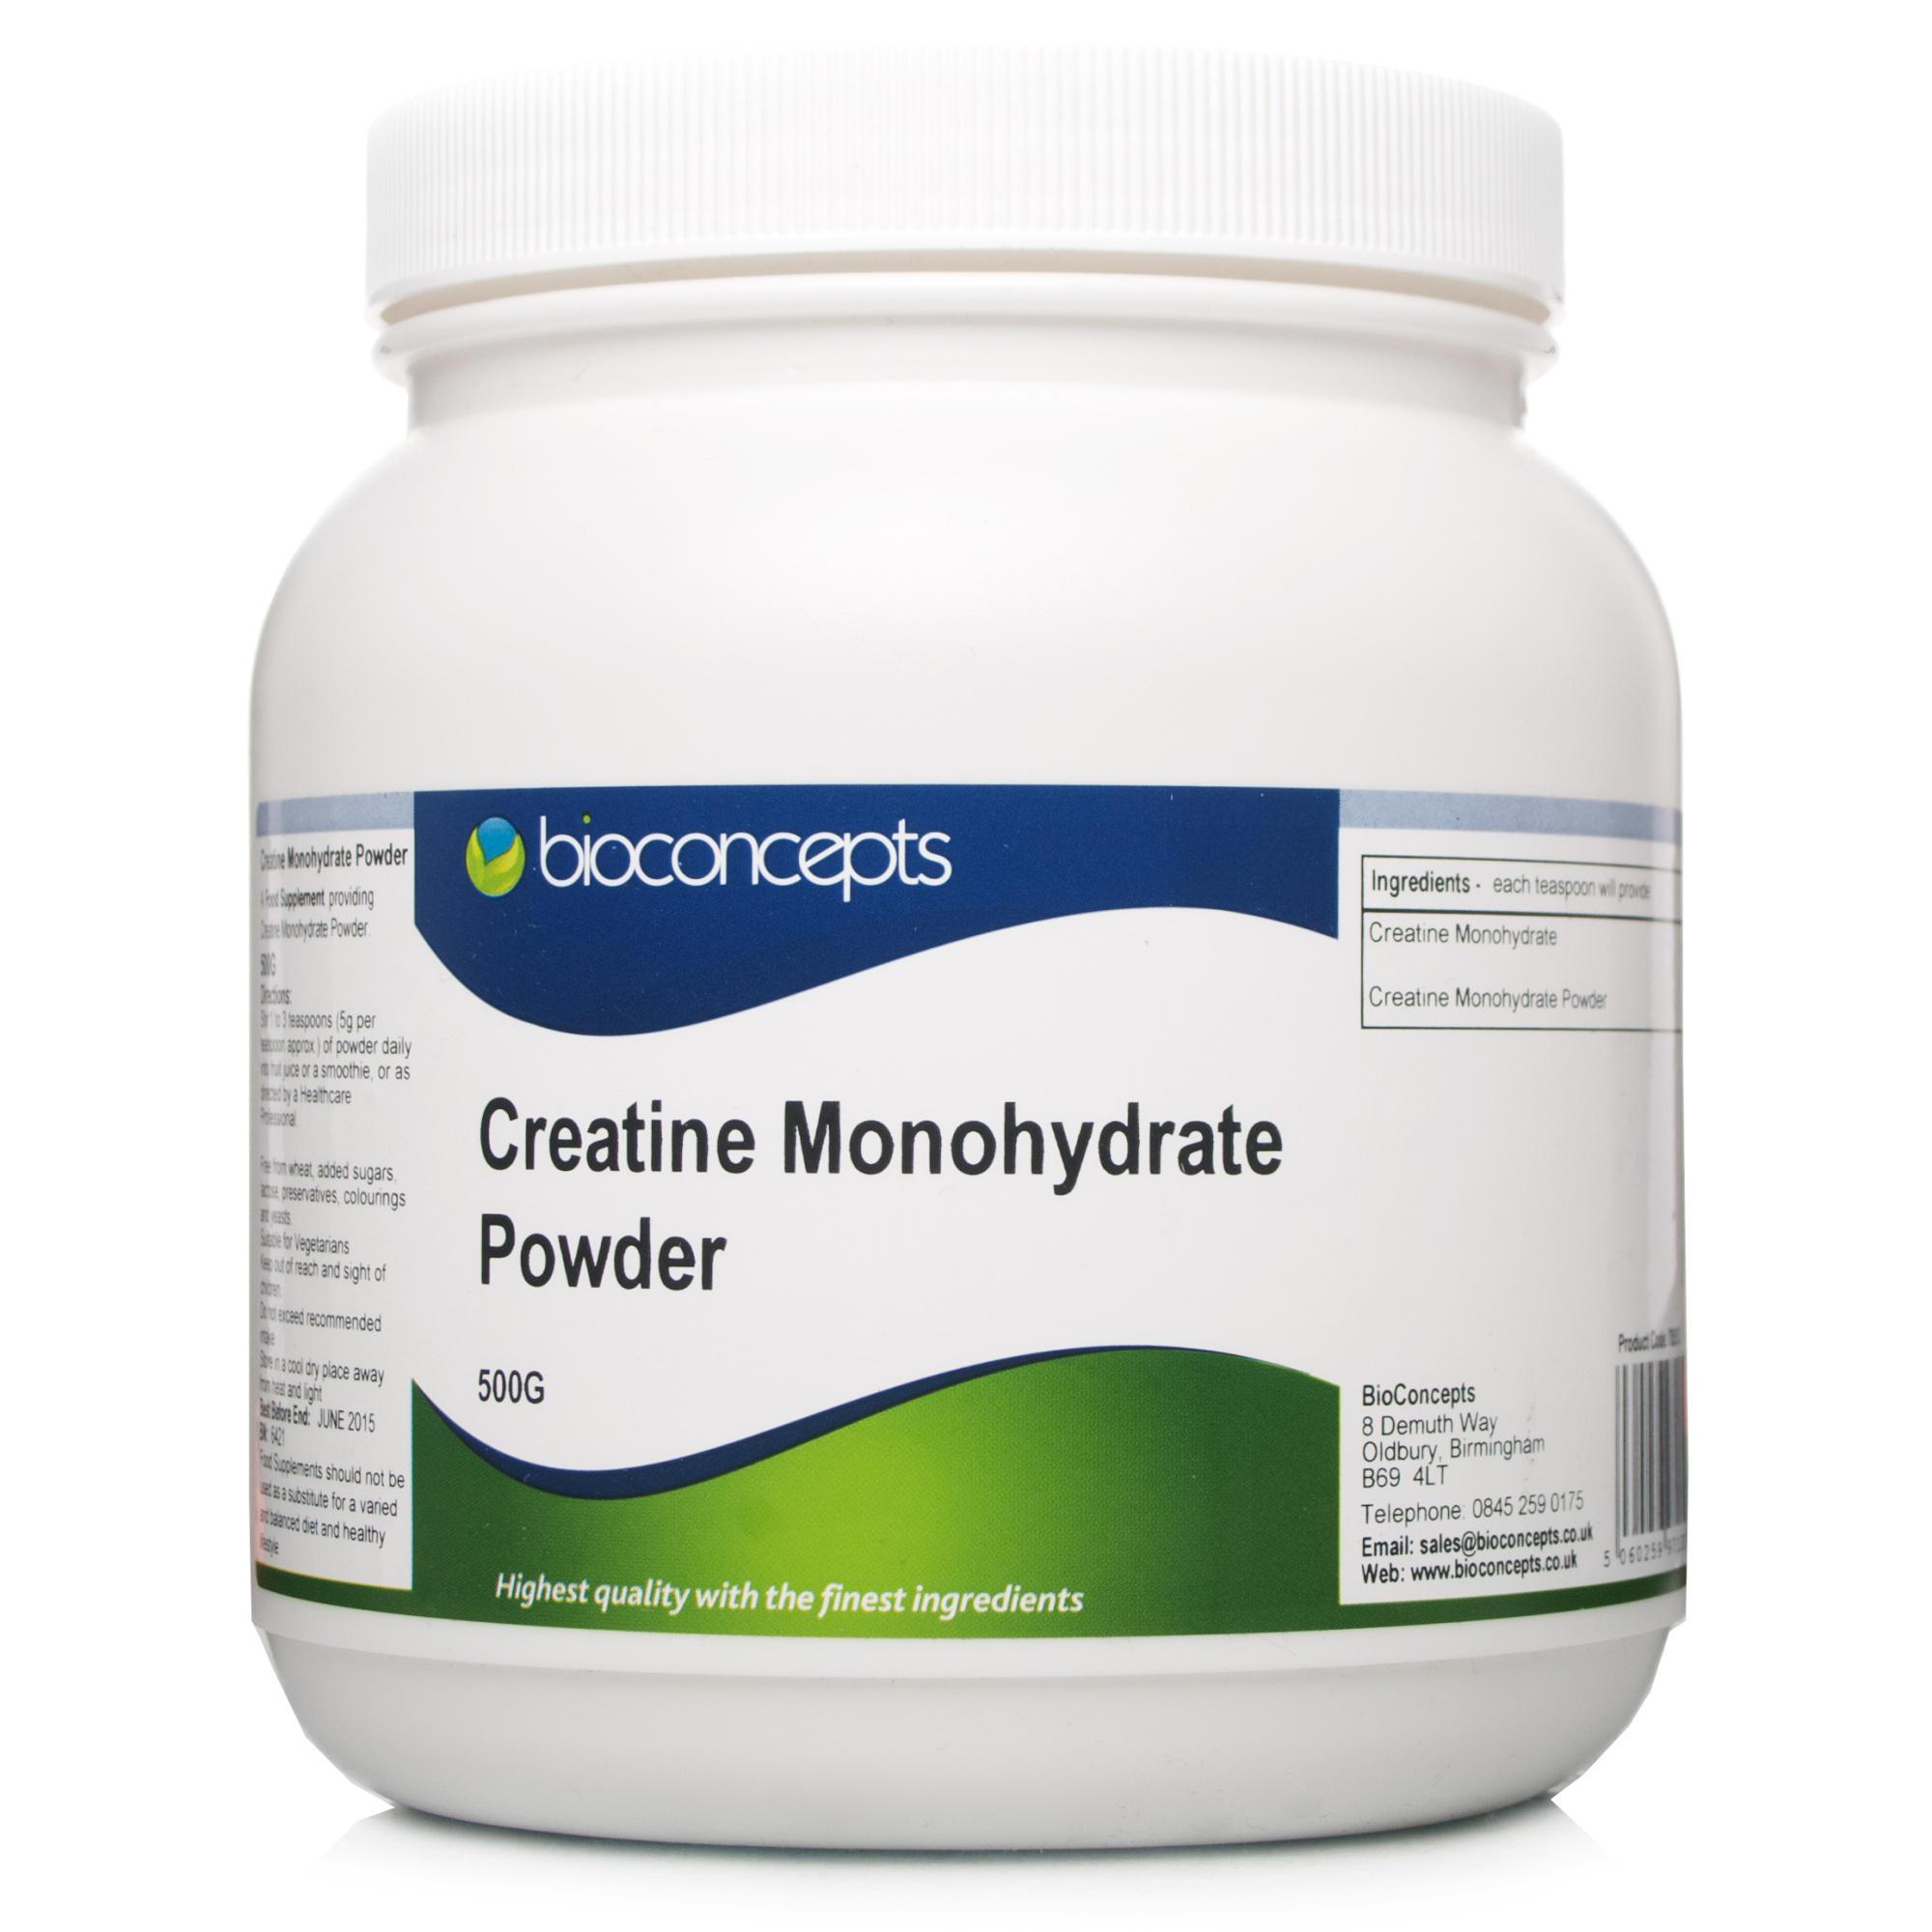 Bioconcepts Creatine Monohydrate Powder 500g